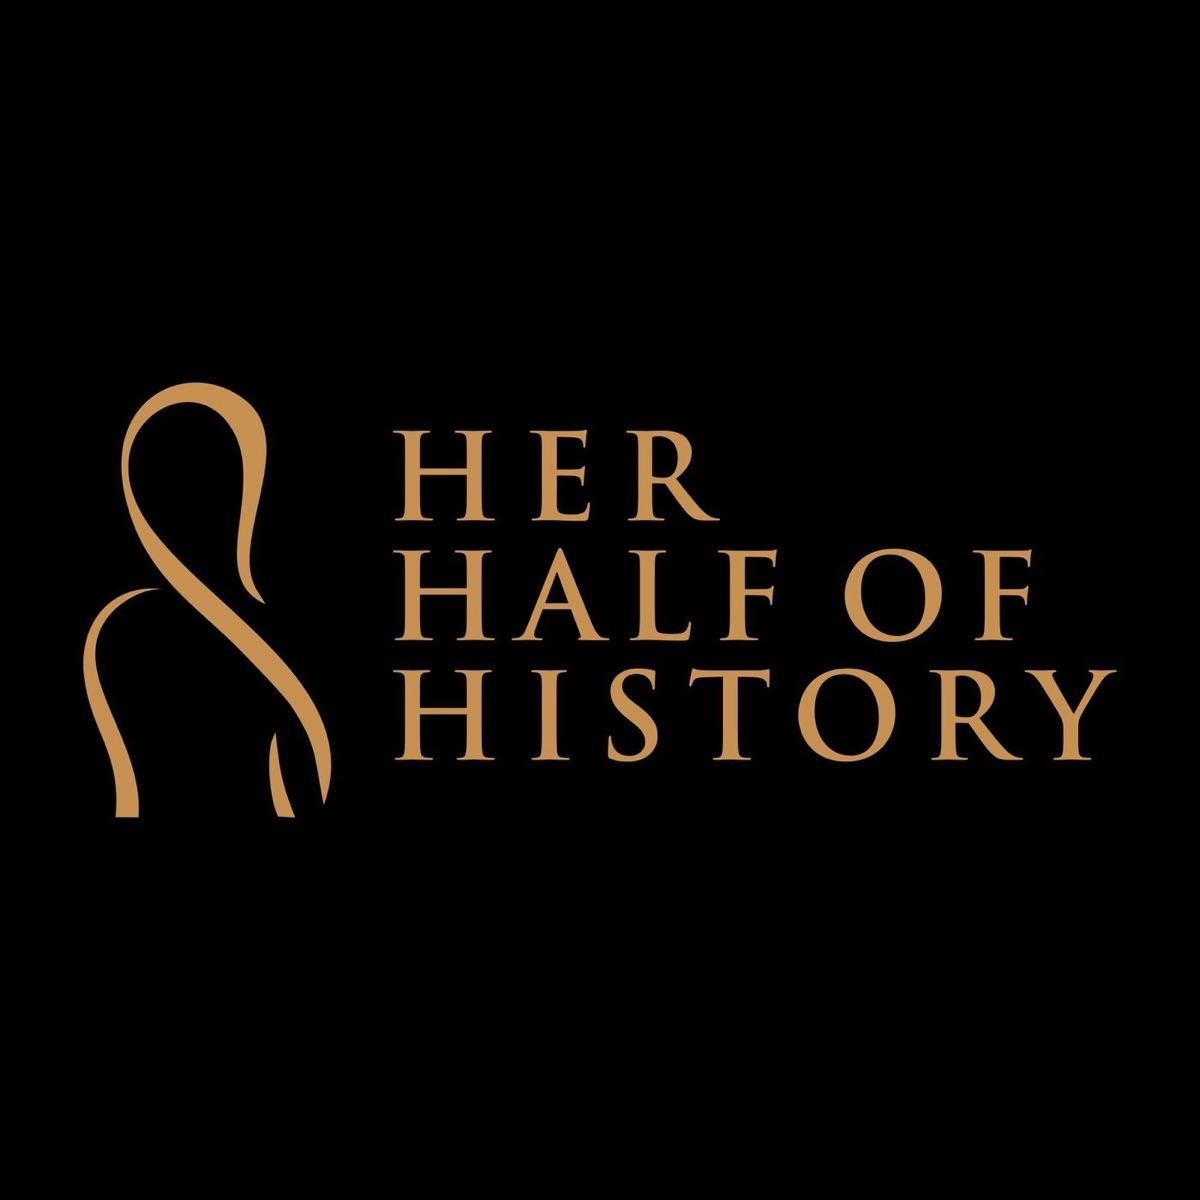 Her Half of History